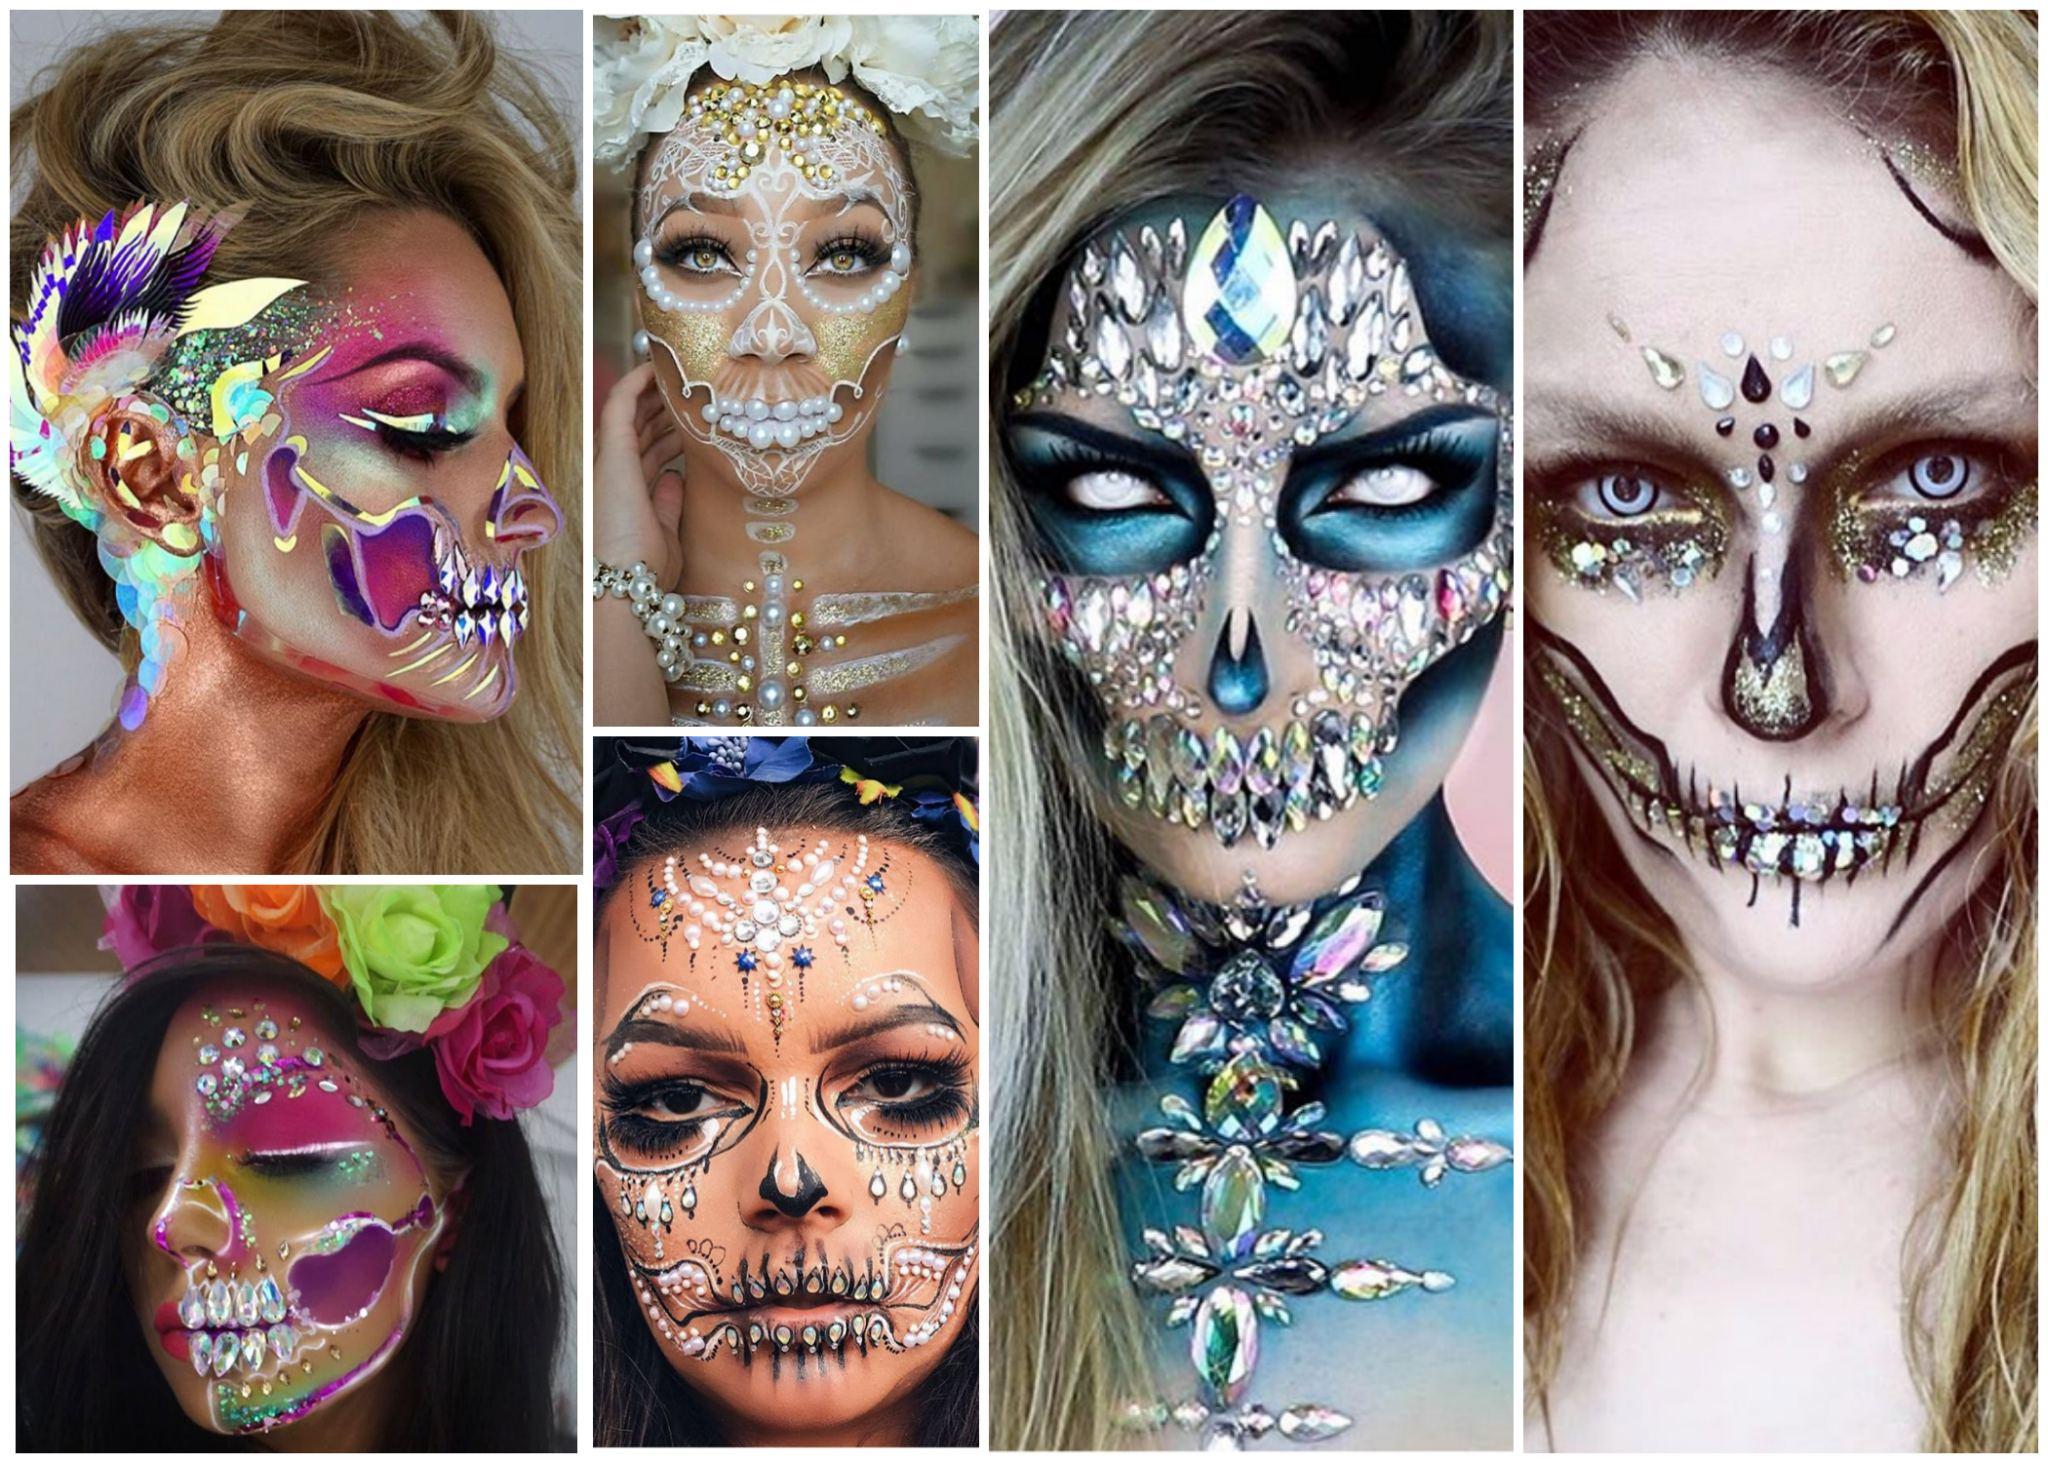 The Sparkliest & Spookiest Halloween Glitter Make-up